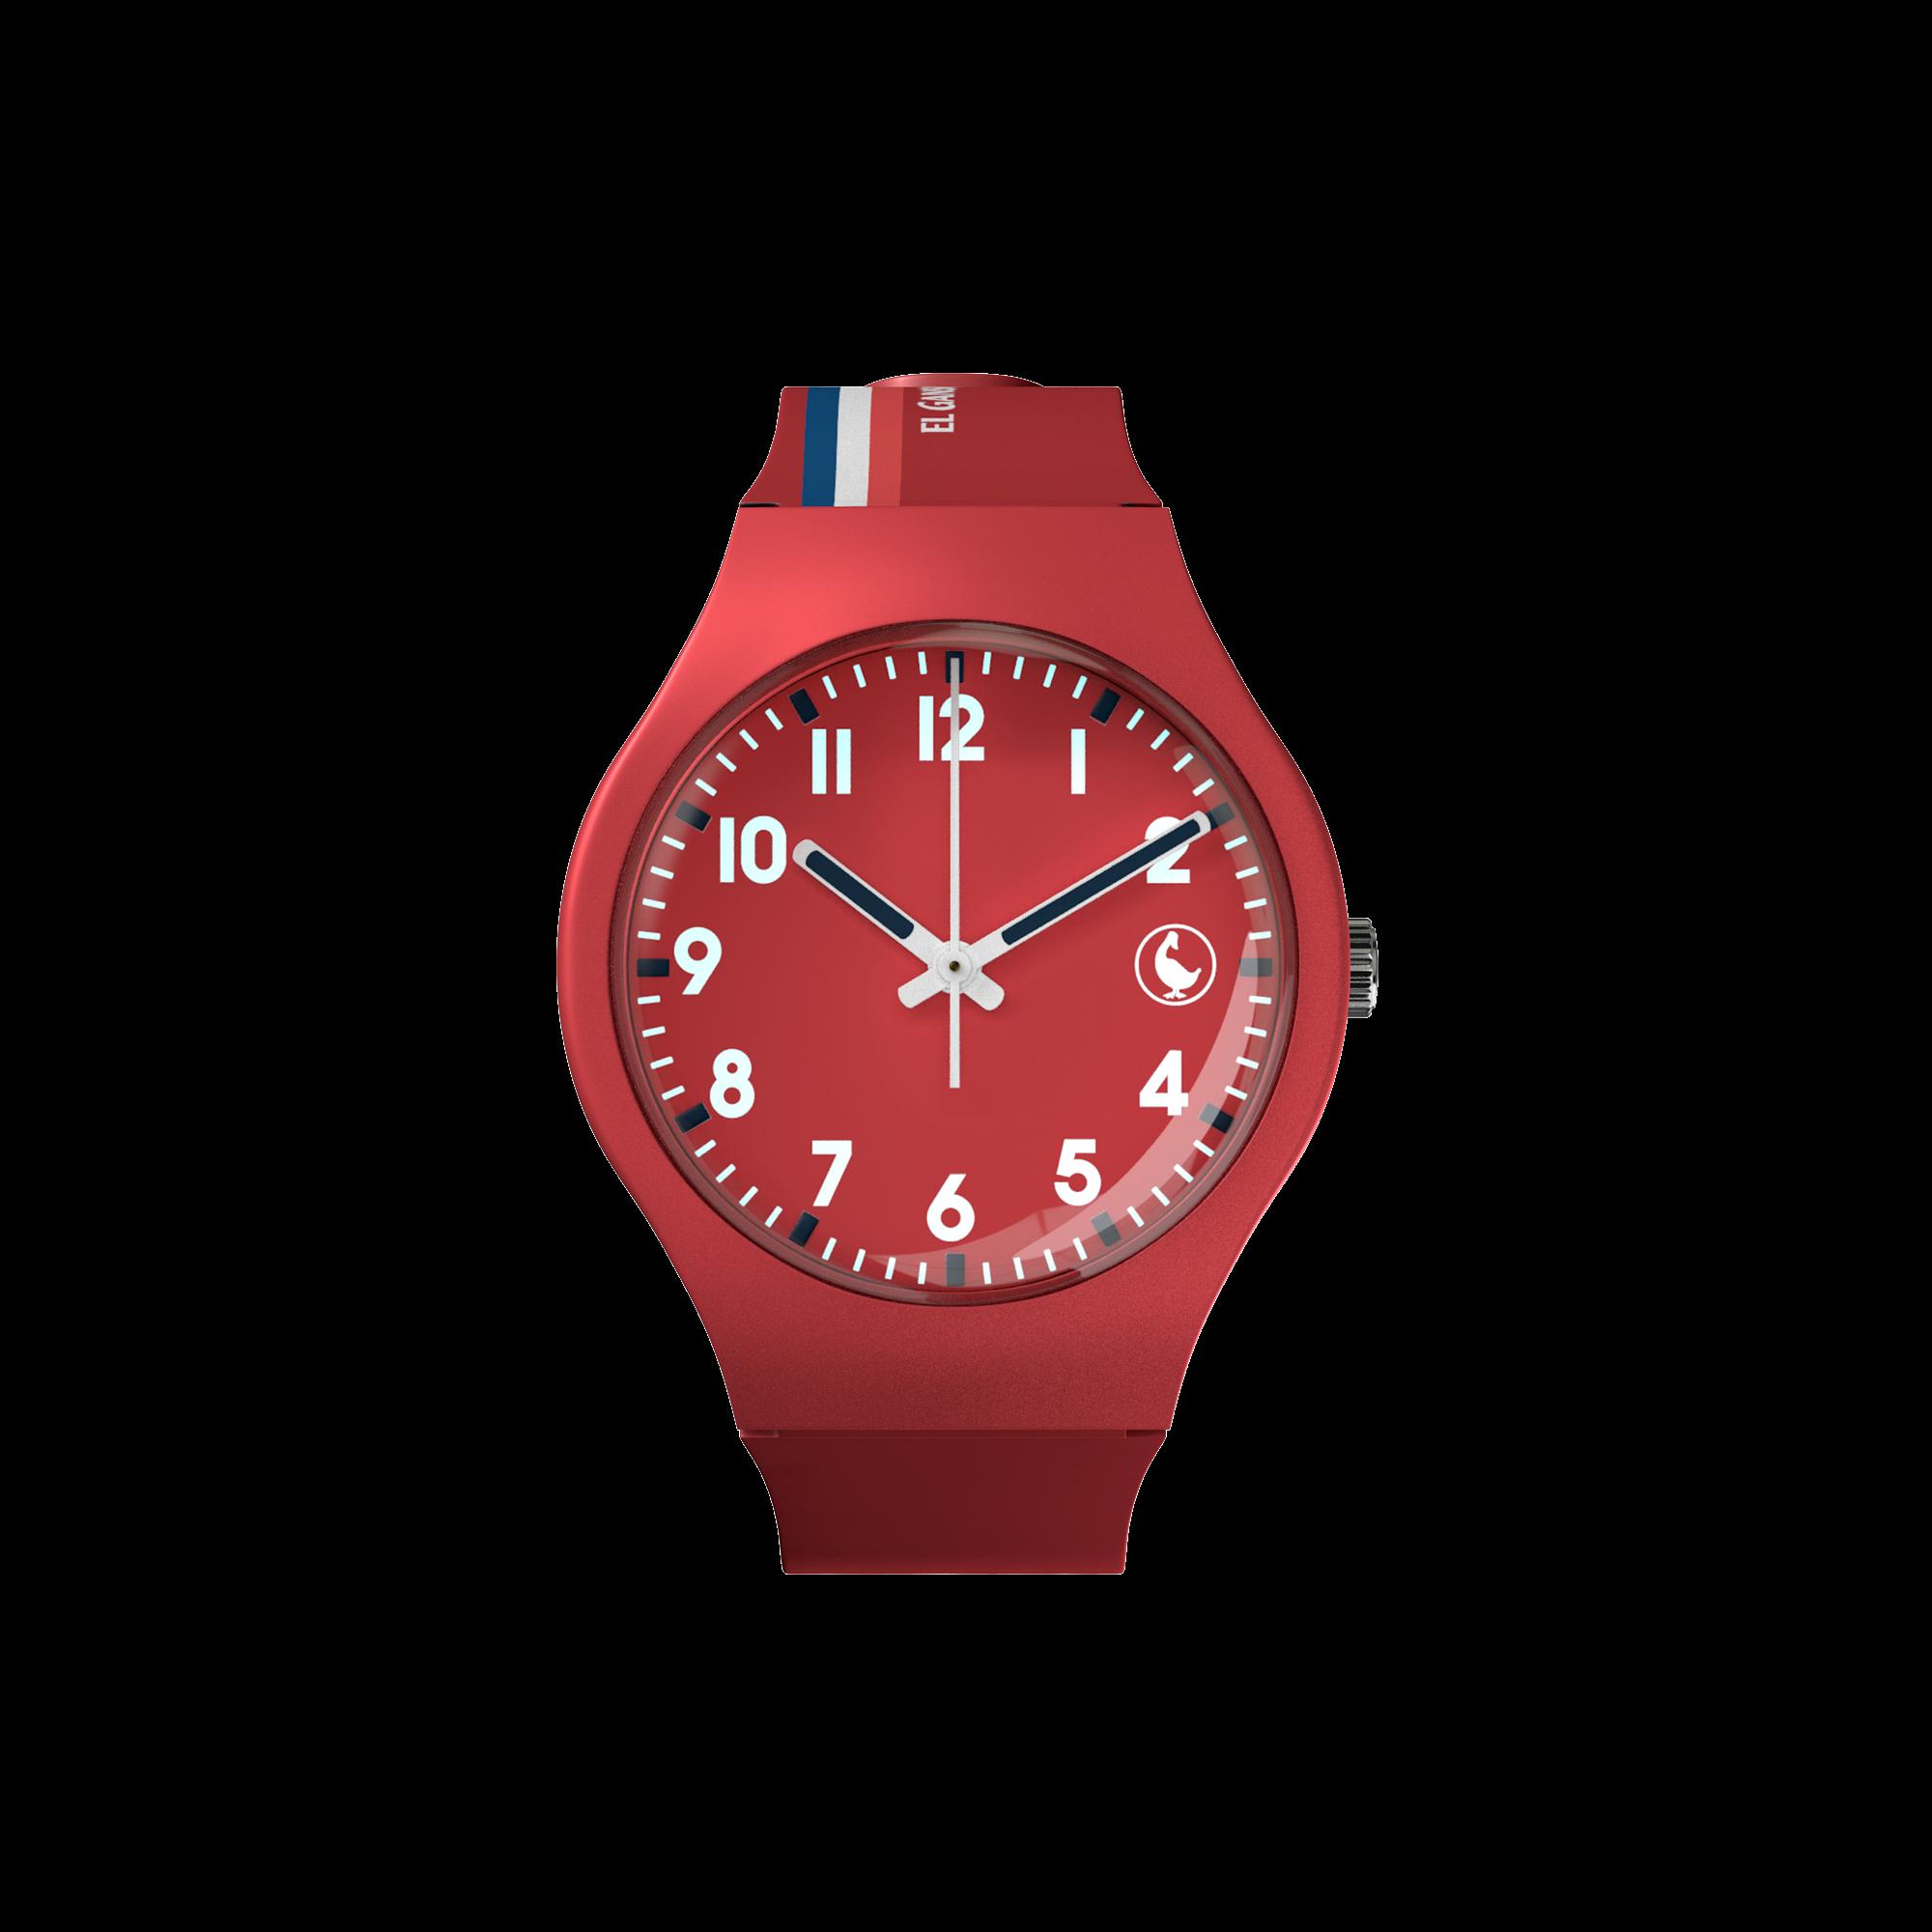 Reloj Ganso Rojo Image 1